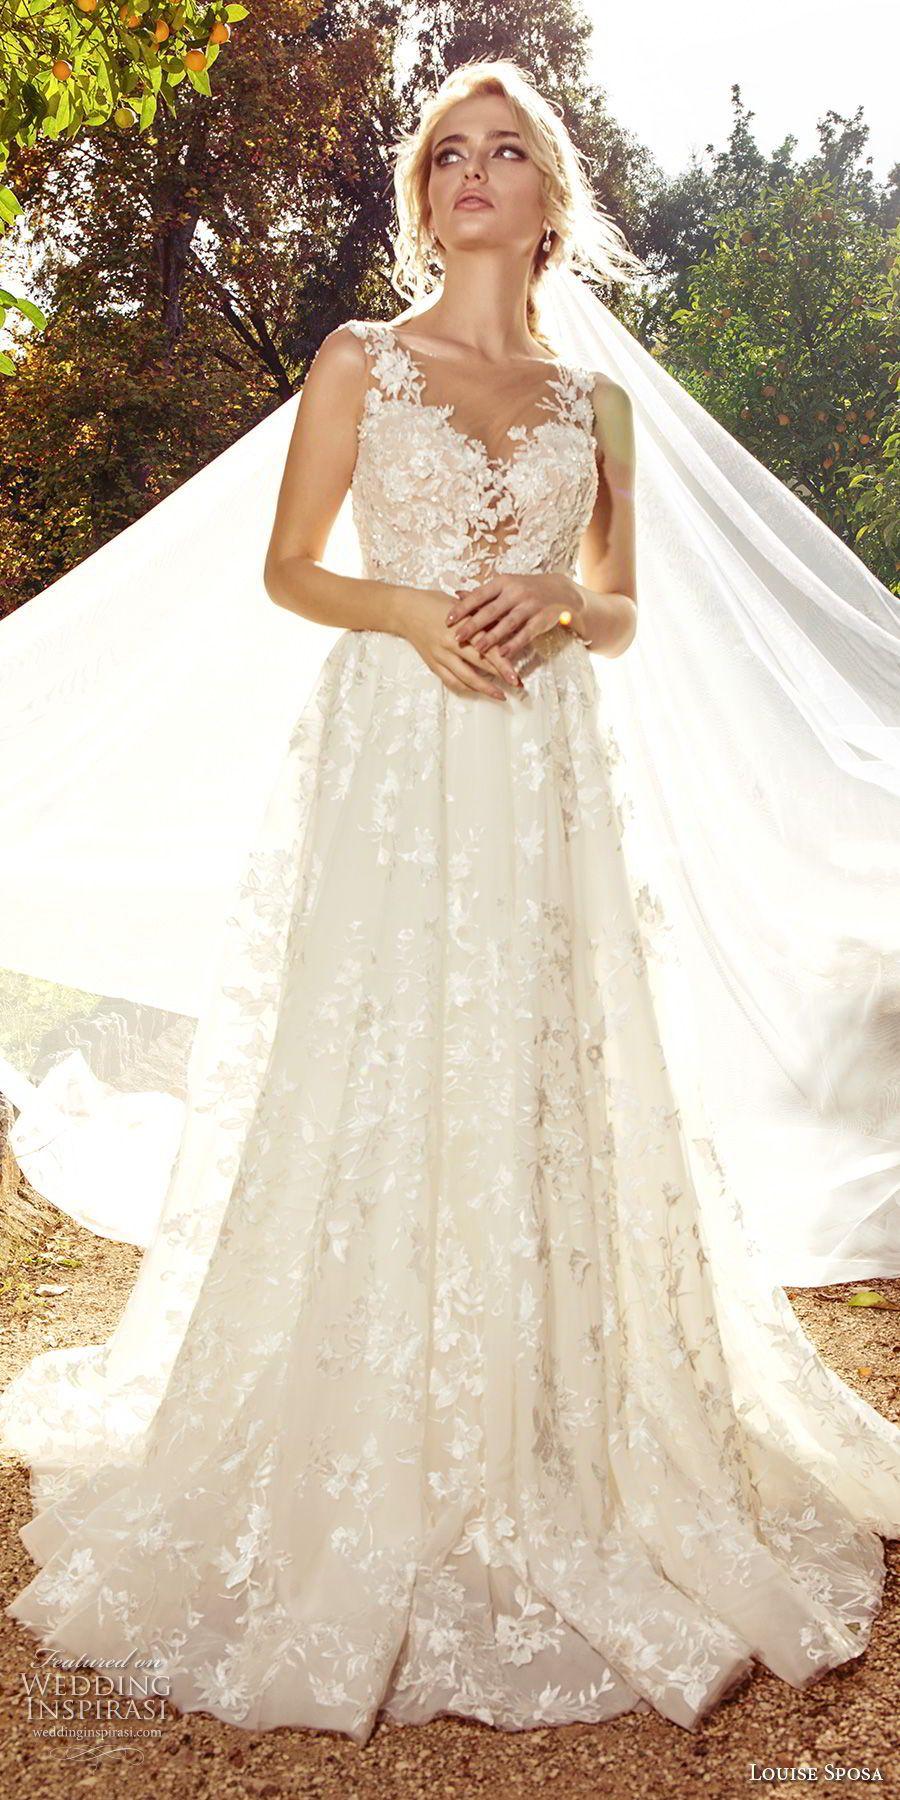 Louise Sposa 2018 Wedding Dresses Wedding Inspirasi Wedding Dresses Wedding Dresses Lace Lace Bridal Gown [ 1800 x 900 Pixel ]